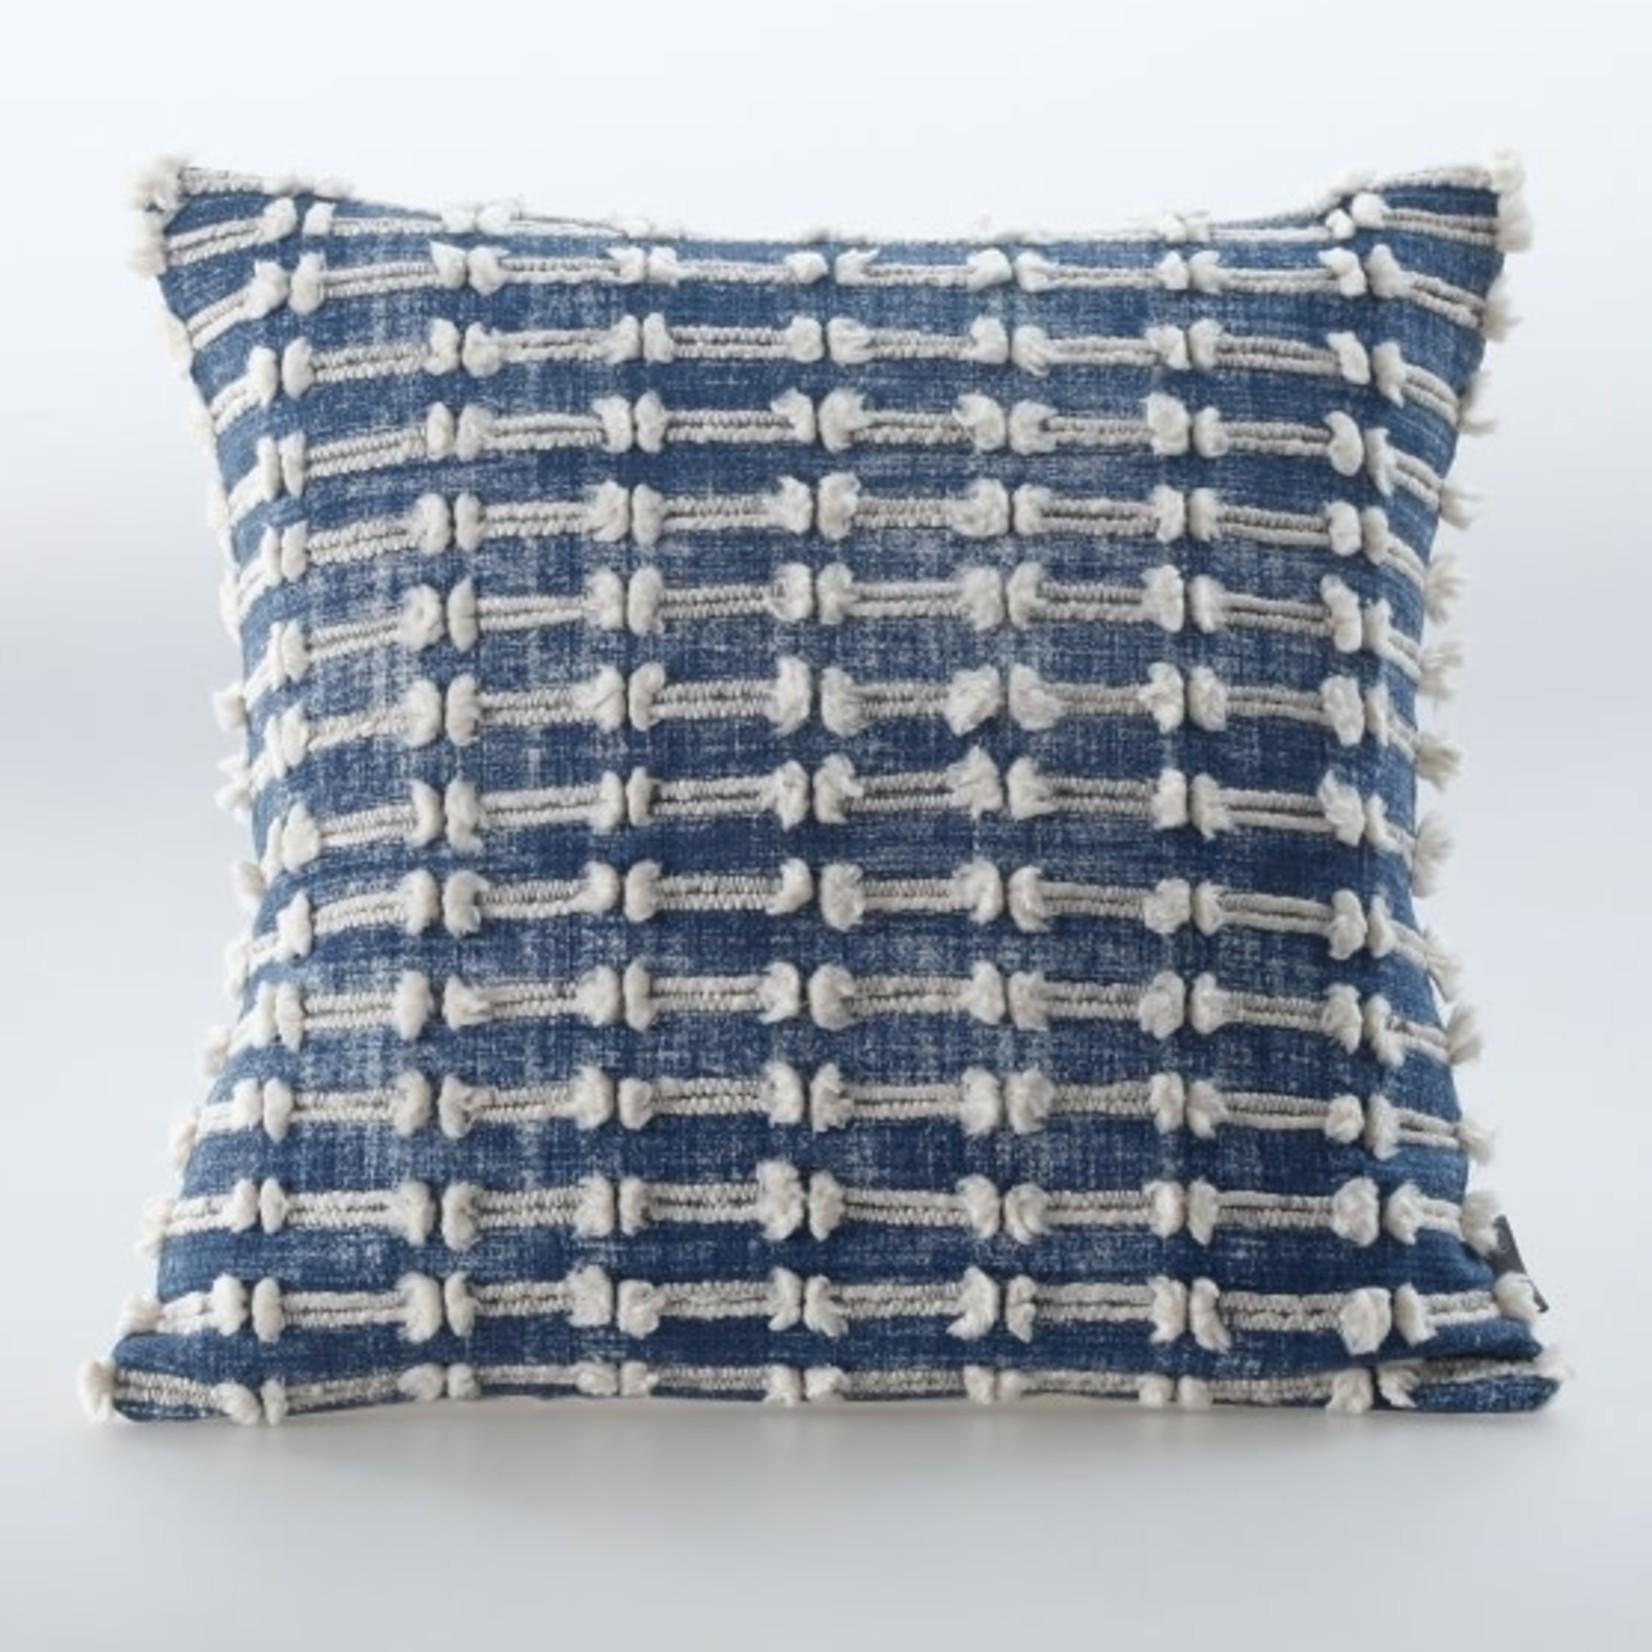 MM Linens SINTRA Cushion Navy